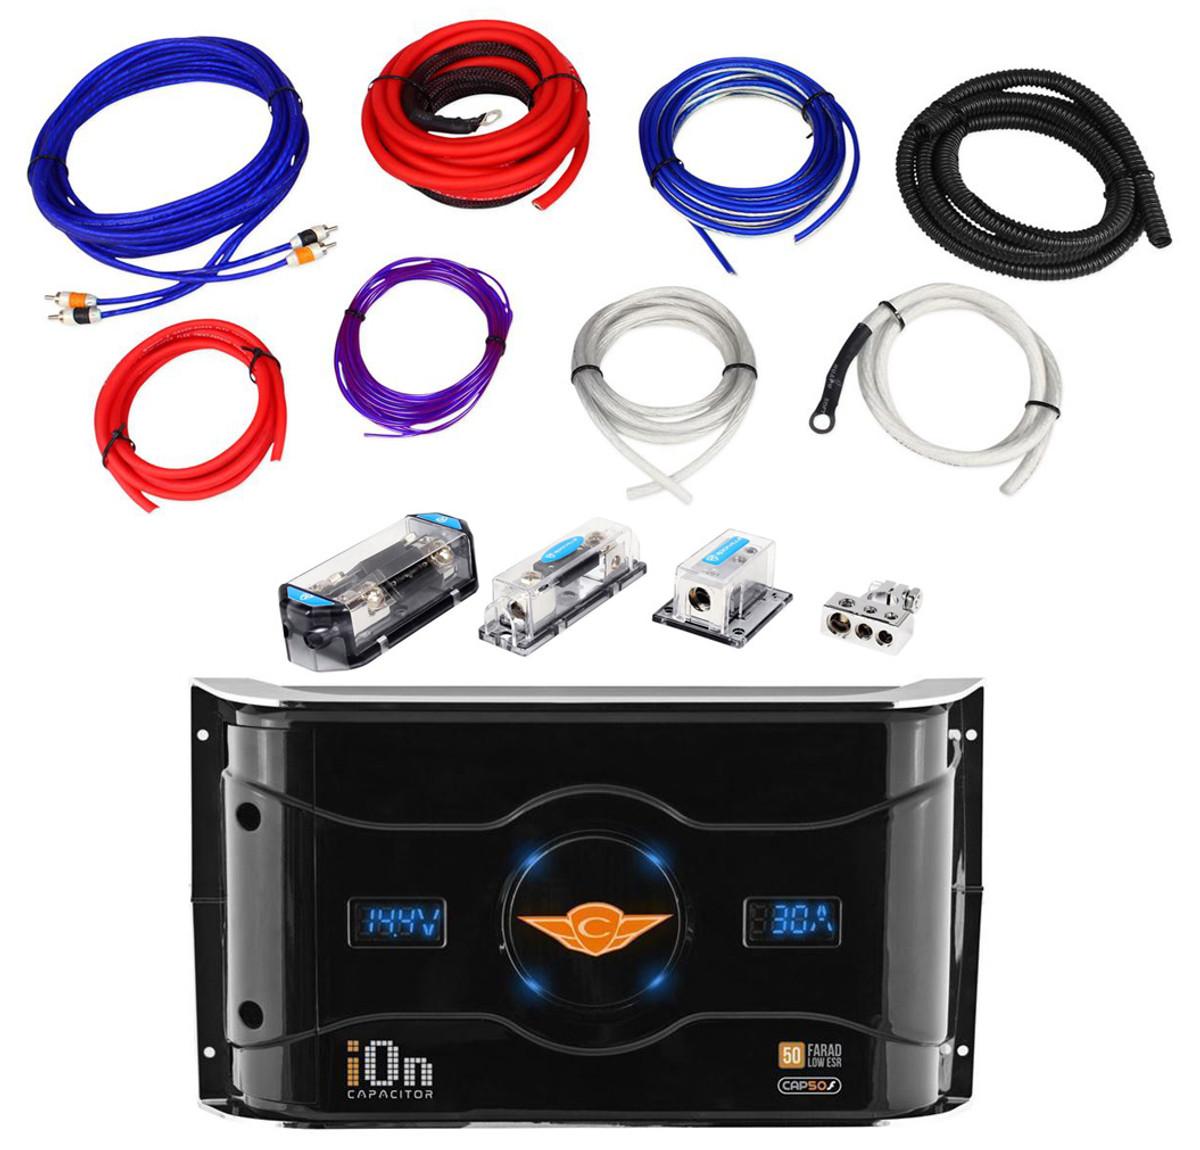 hight resolution of rockville rda0 4k 0 4 gauge dual amp install kit cap50f 50 farad dual amp wiring kit with capacitor